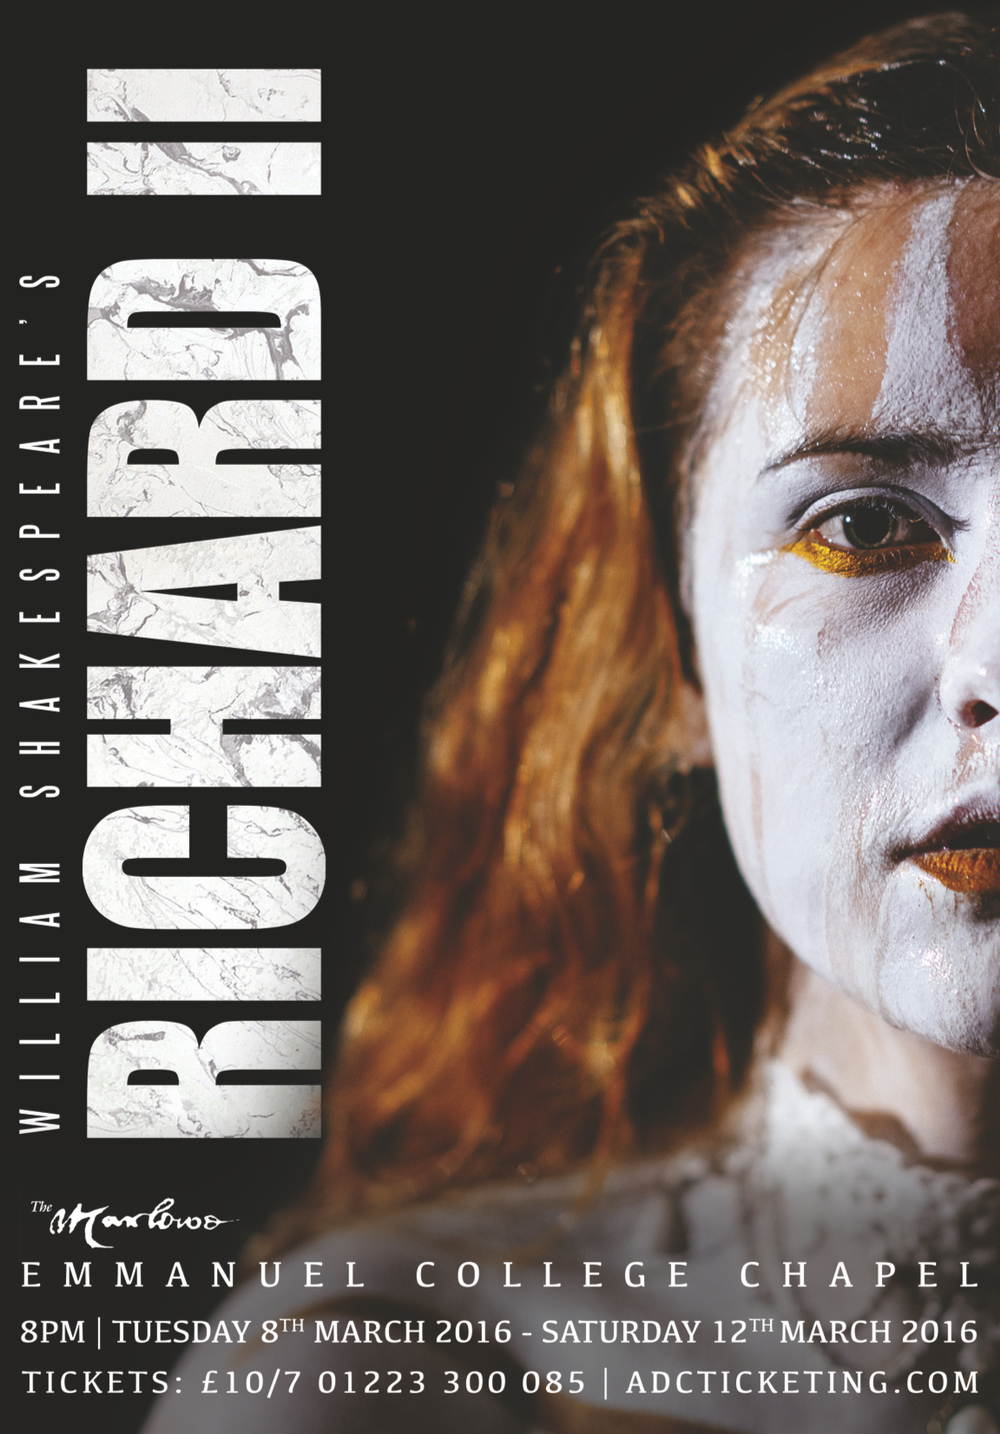 Gabriel Agranoff - Richard II